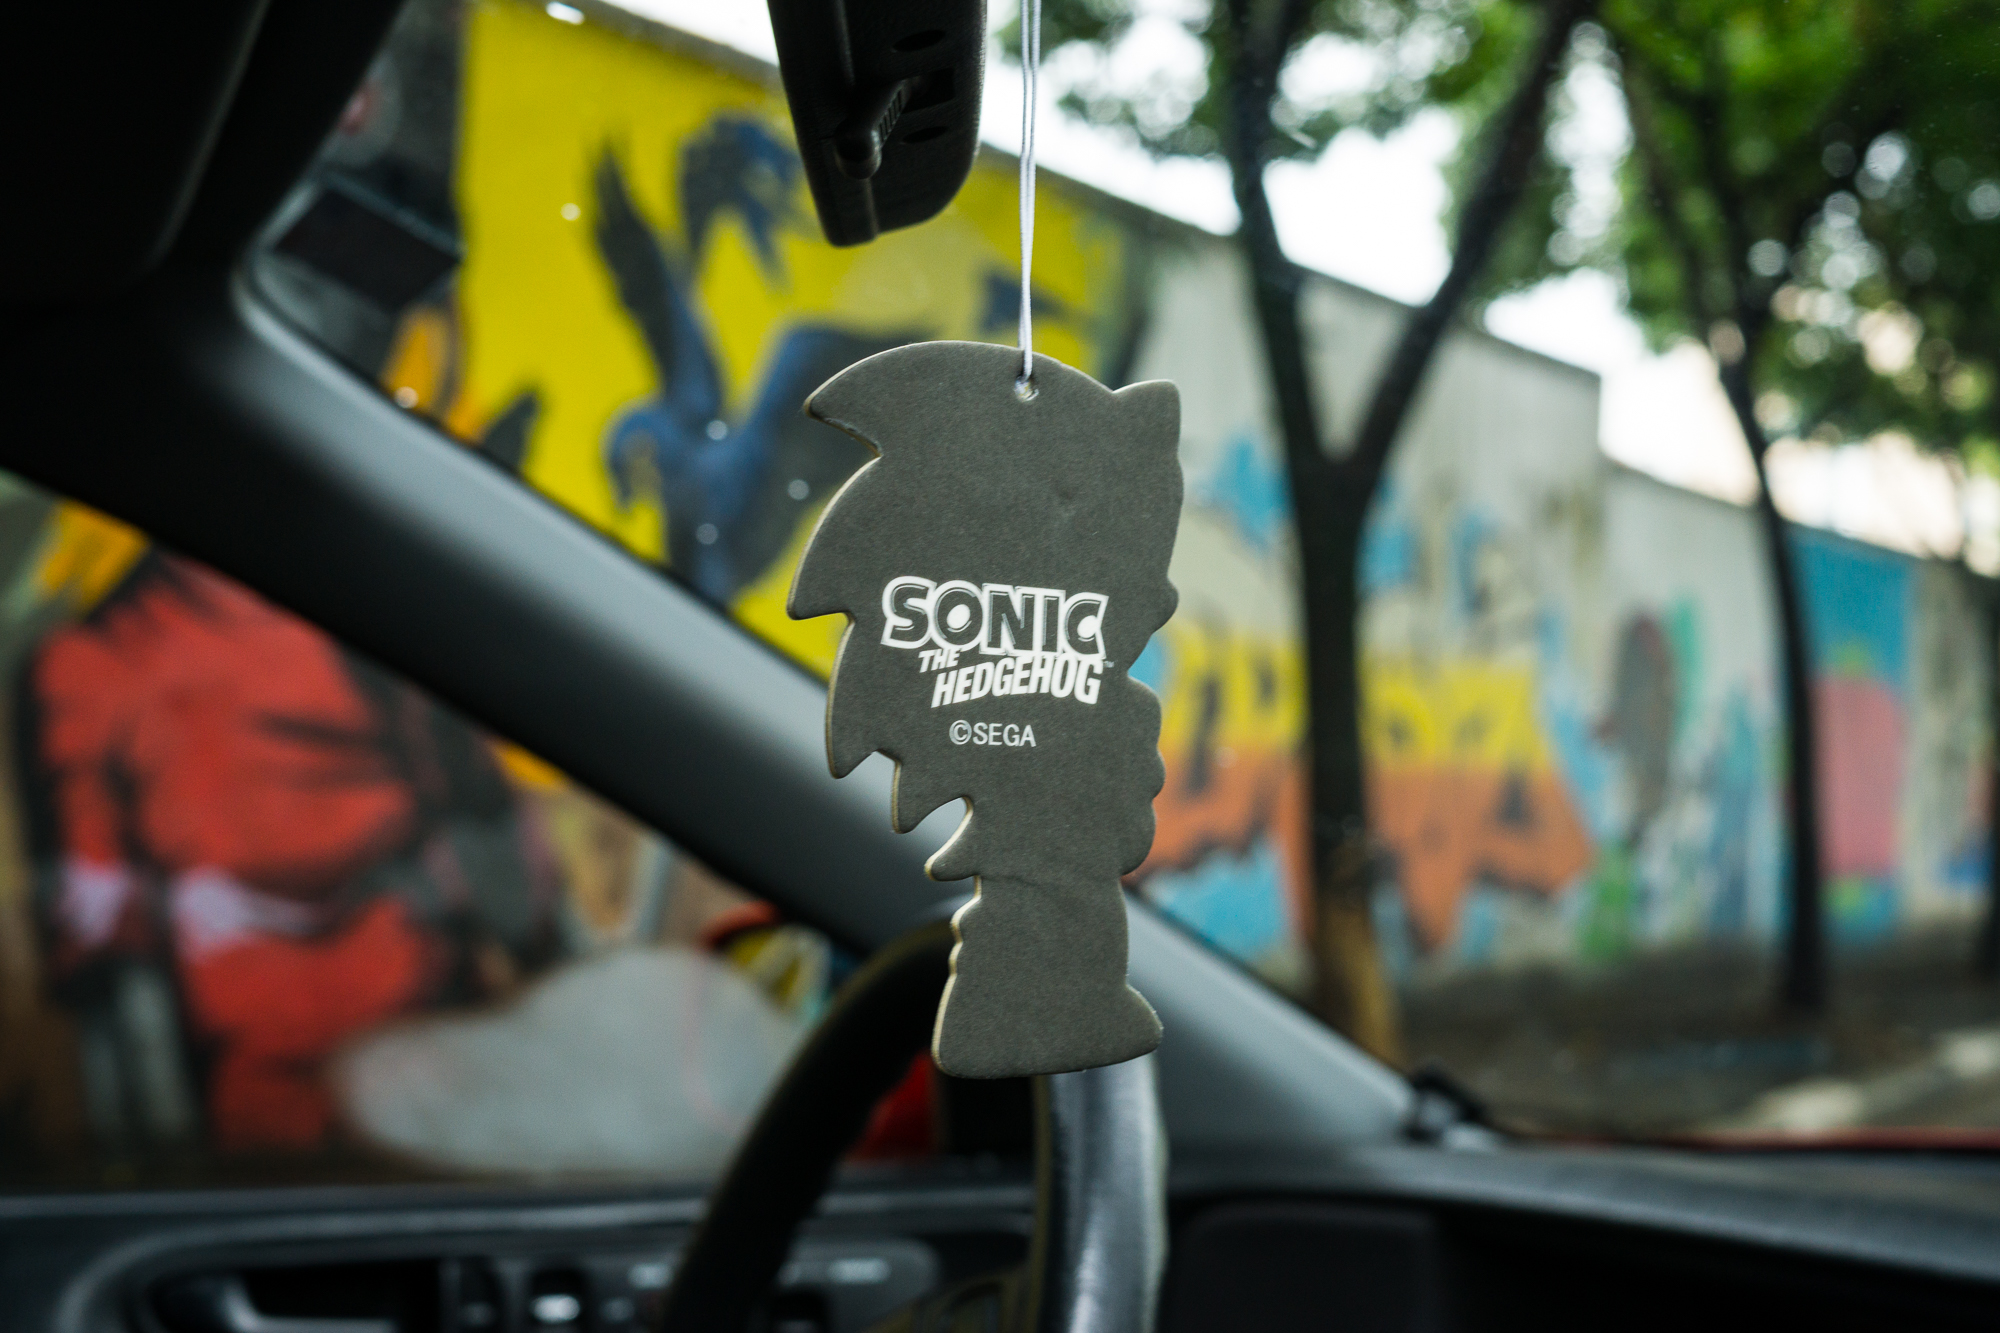 Sonic the Hedgehog rear mirror ornament